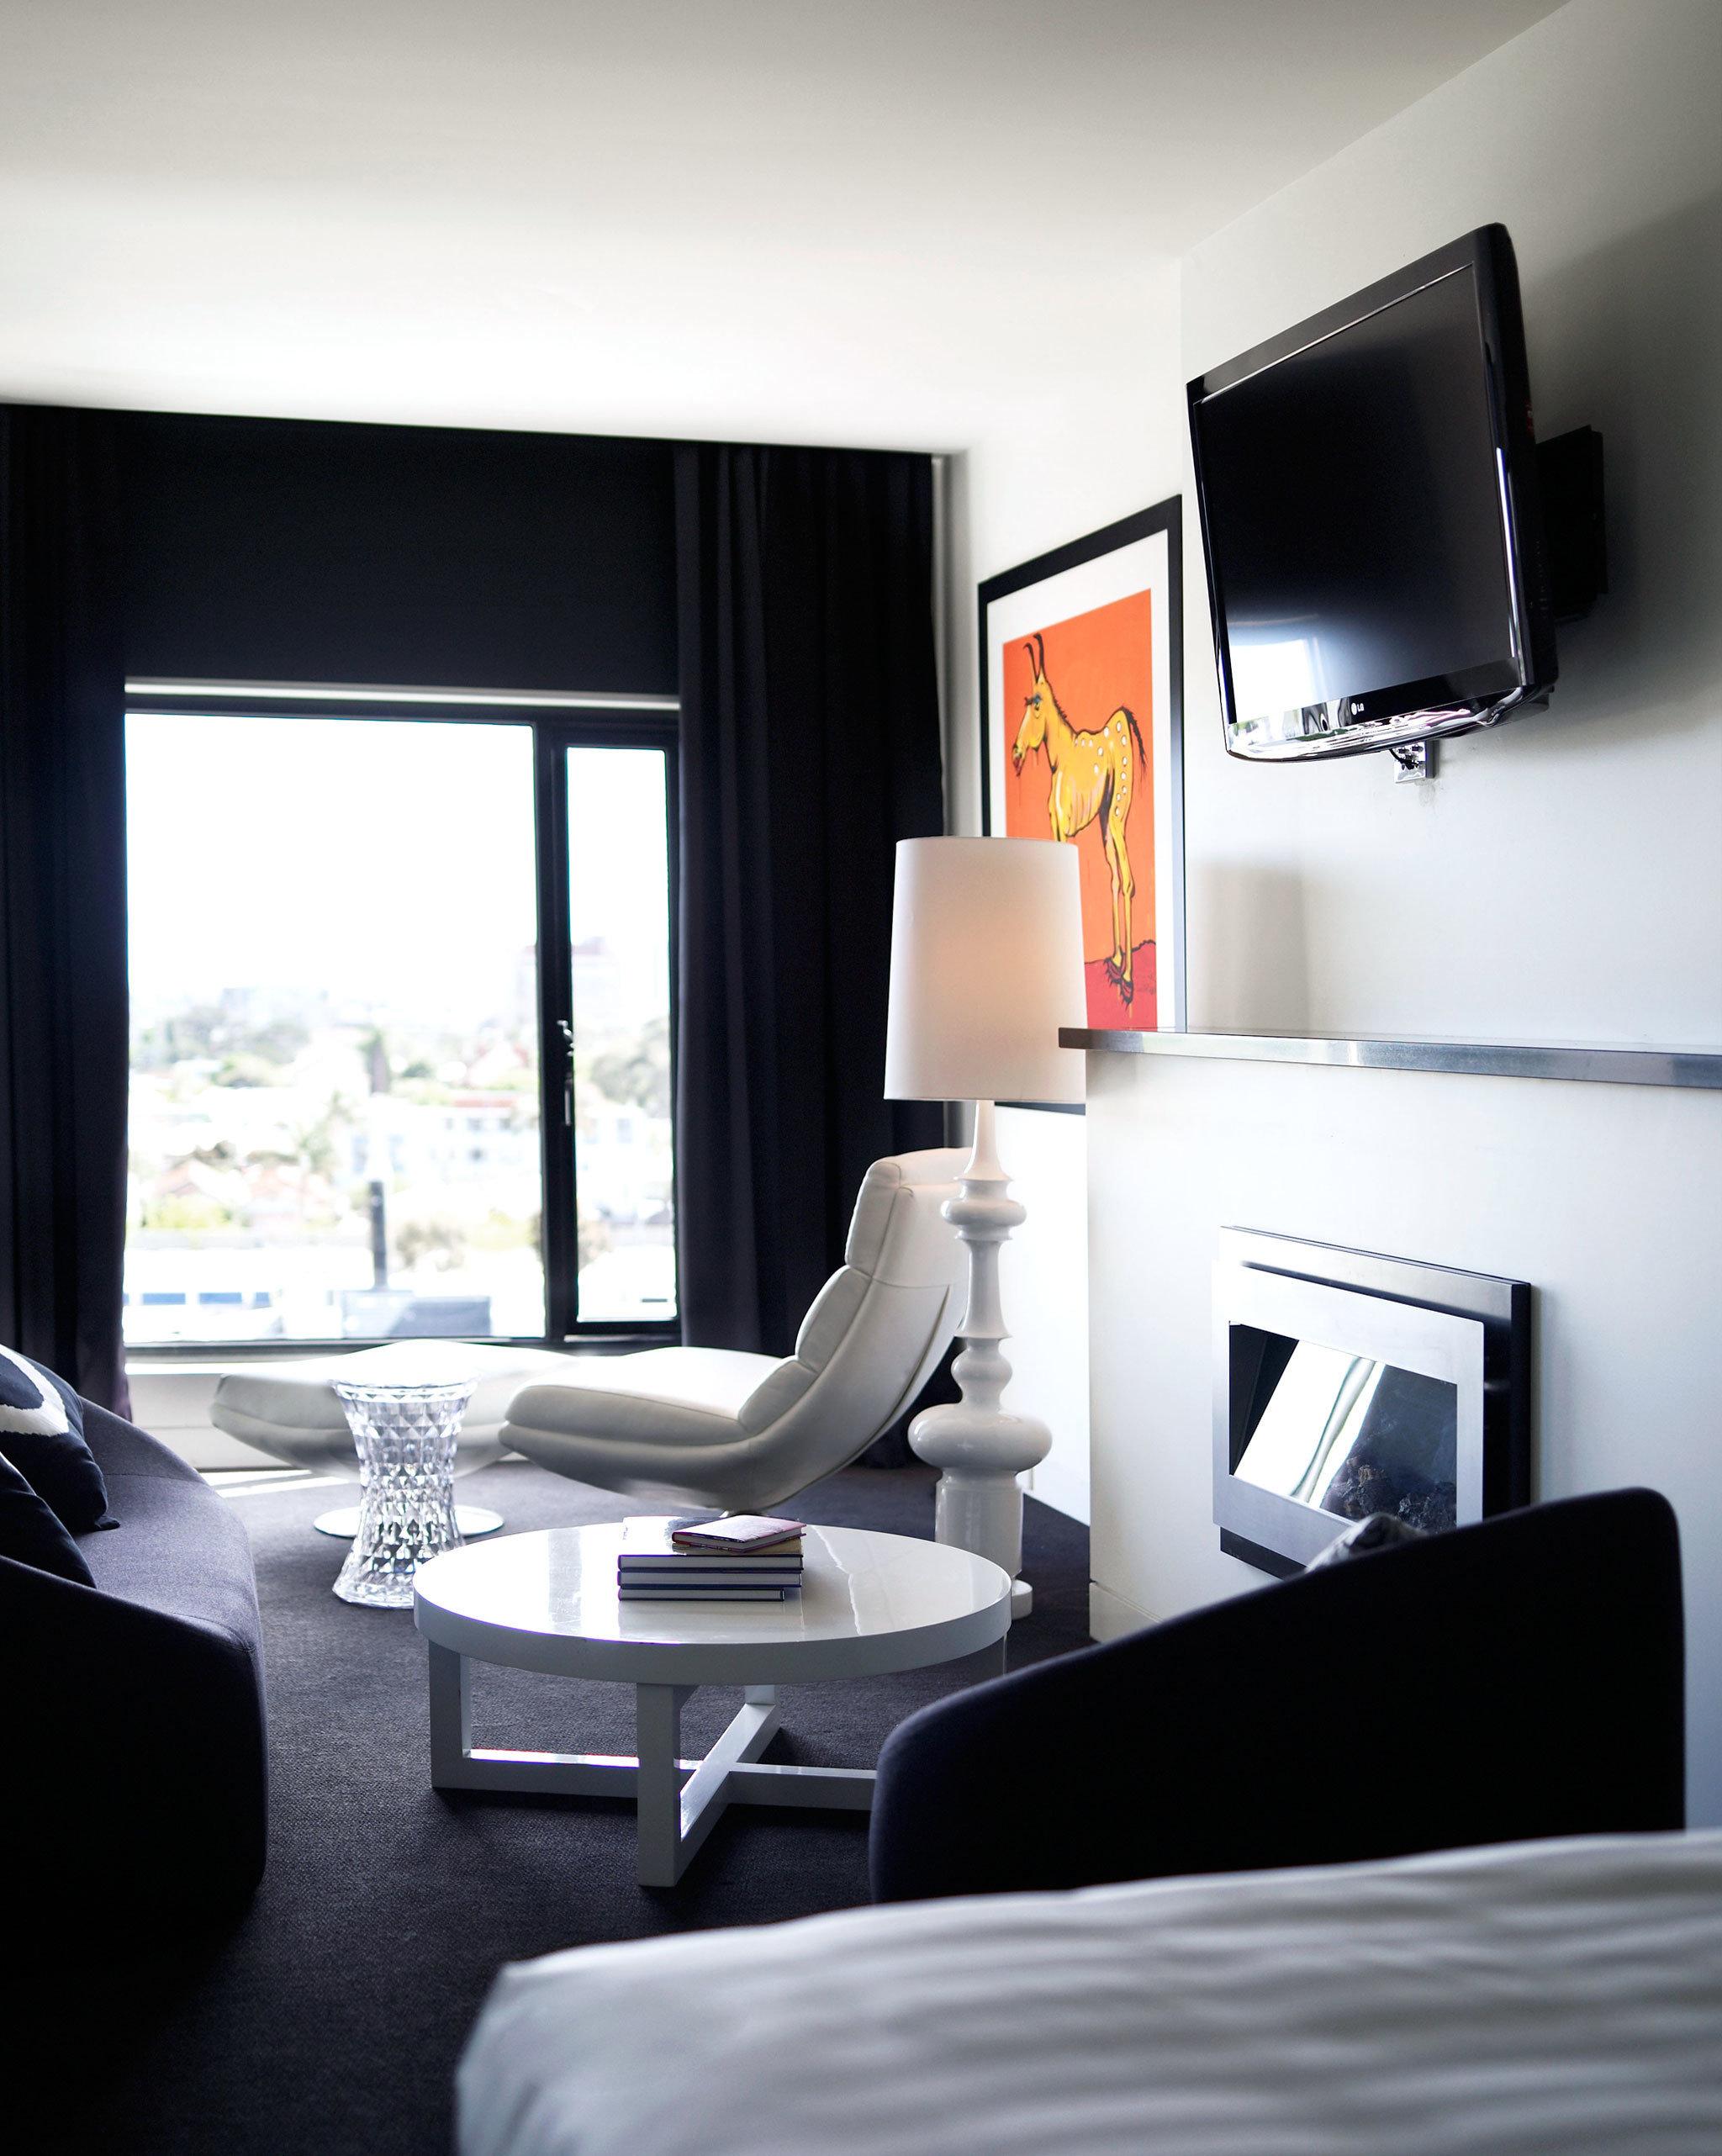 Bedroom Hip Modern living room property home white lighting Suite pillow